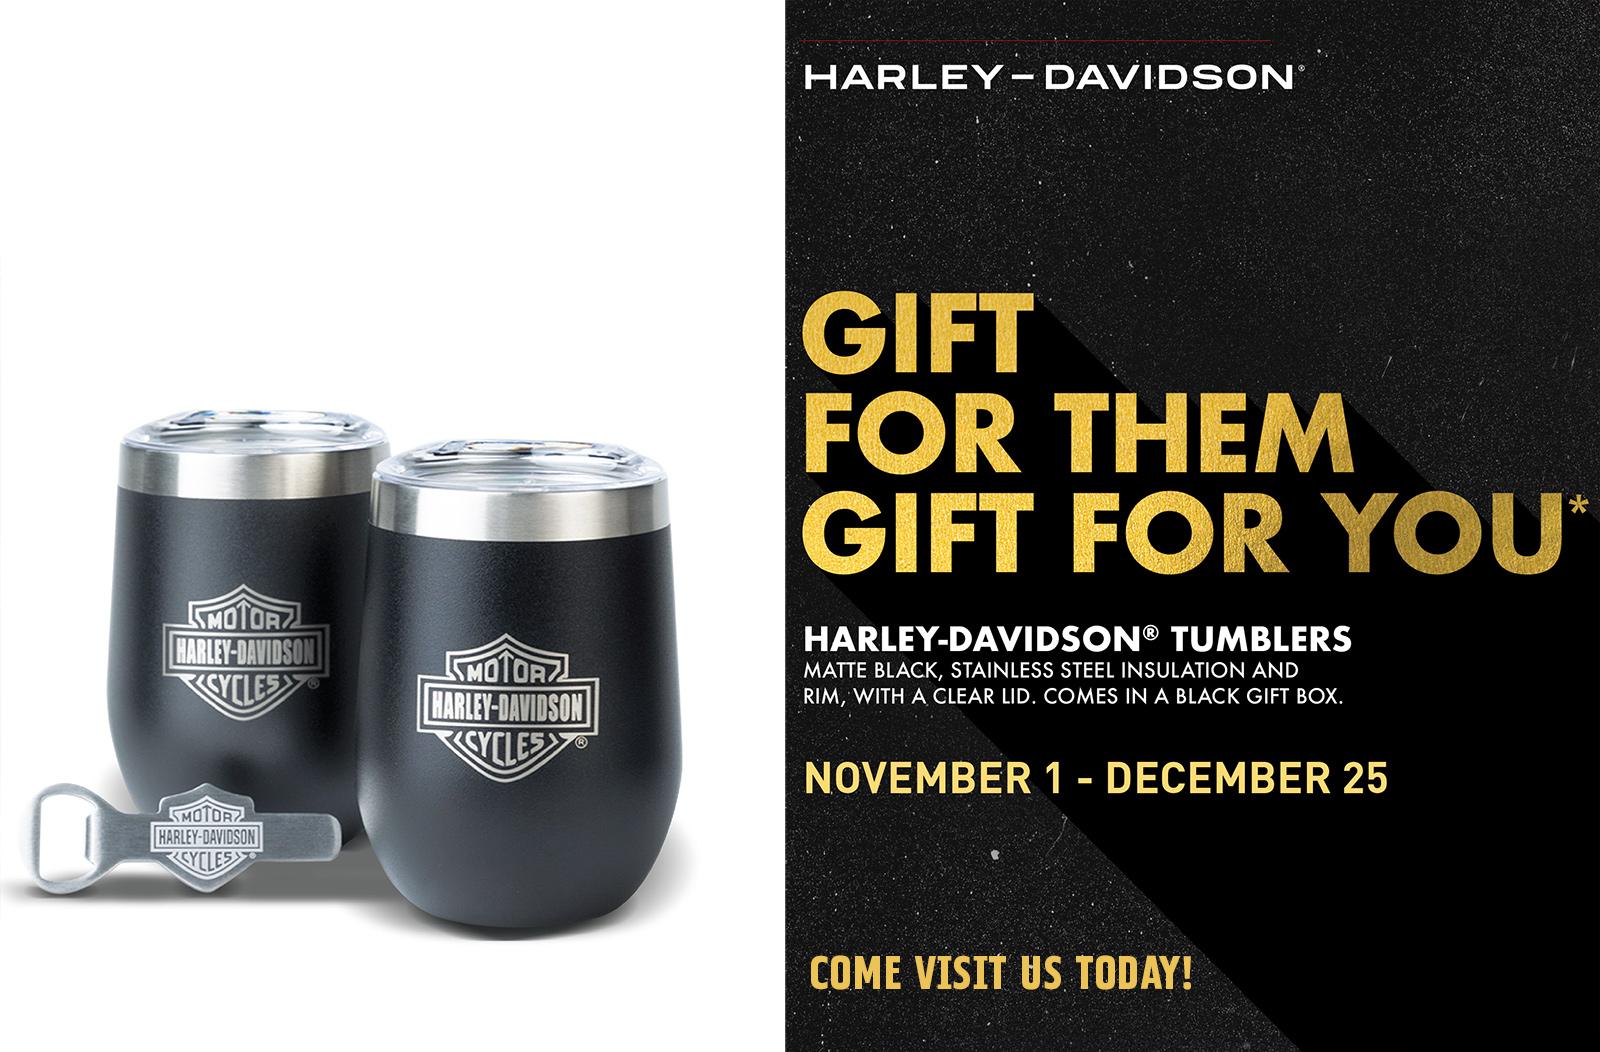 Harley-Davidson Holiday 2020 Gift with Purchase - Tumbler Set